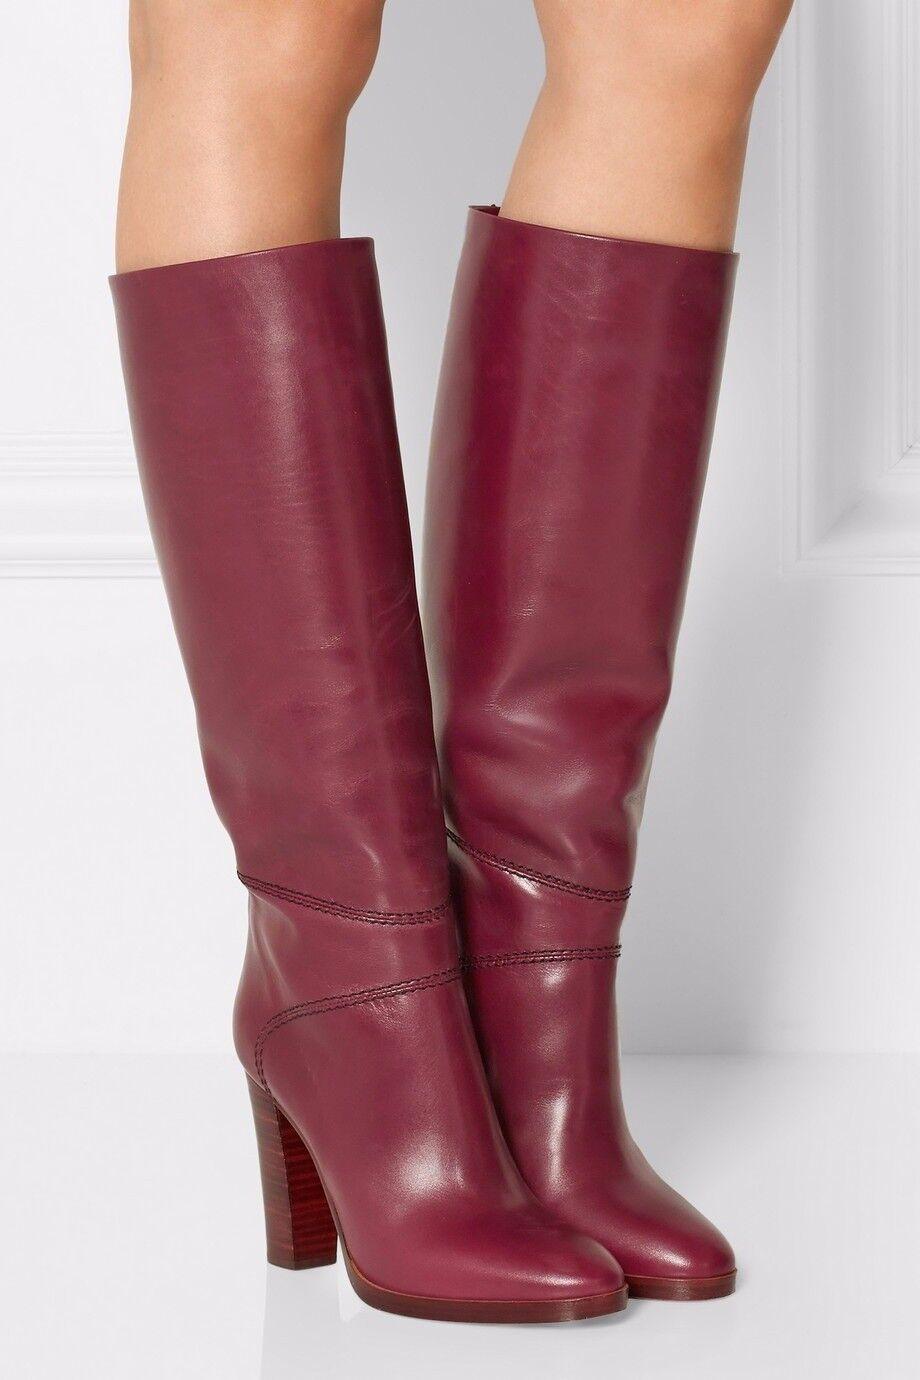 Vintage Wouomo Knee High stivali Block High Heels Round Toe Knight avvio scarpe